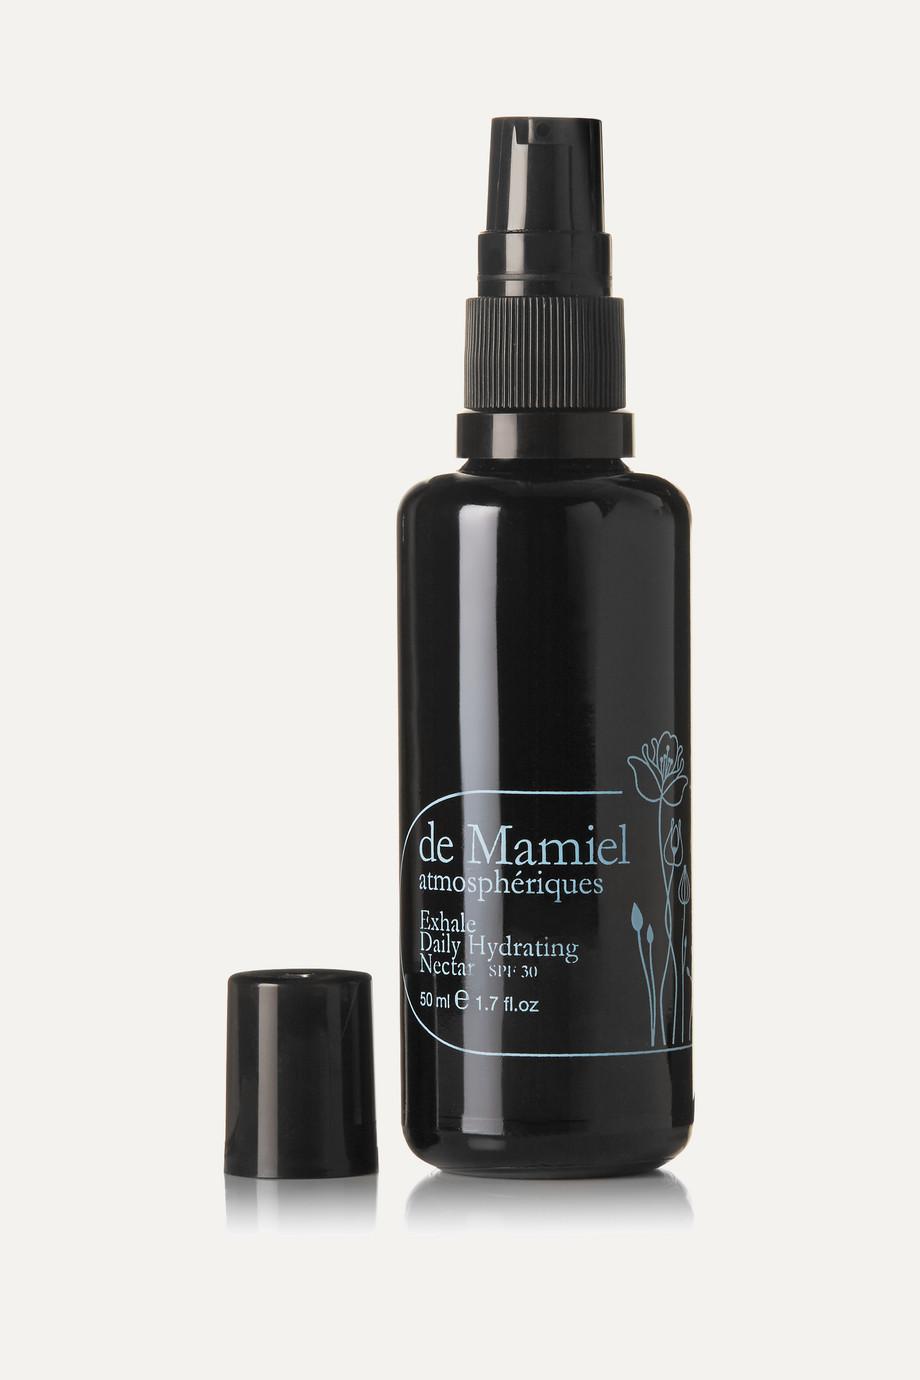 de Mamiel Exhale Daily Hydrating Nectar, 50ml